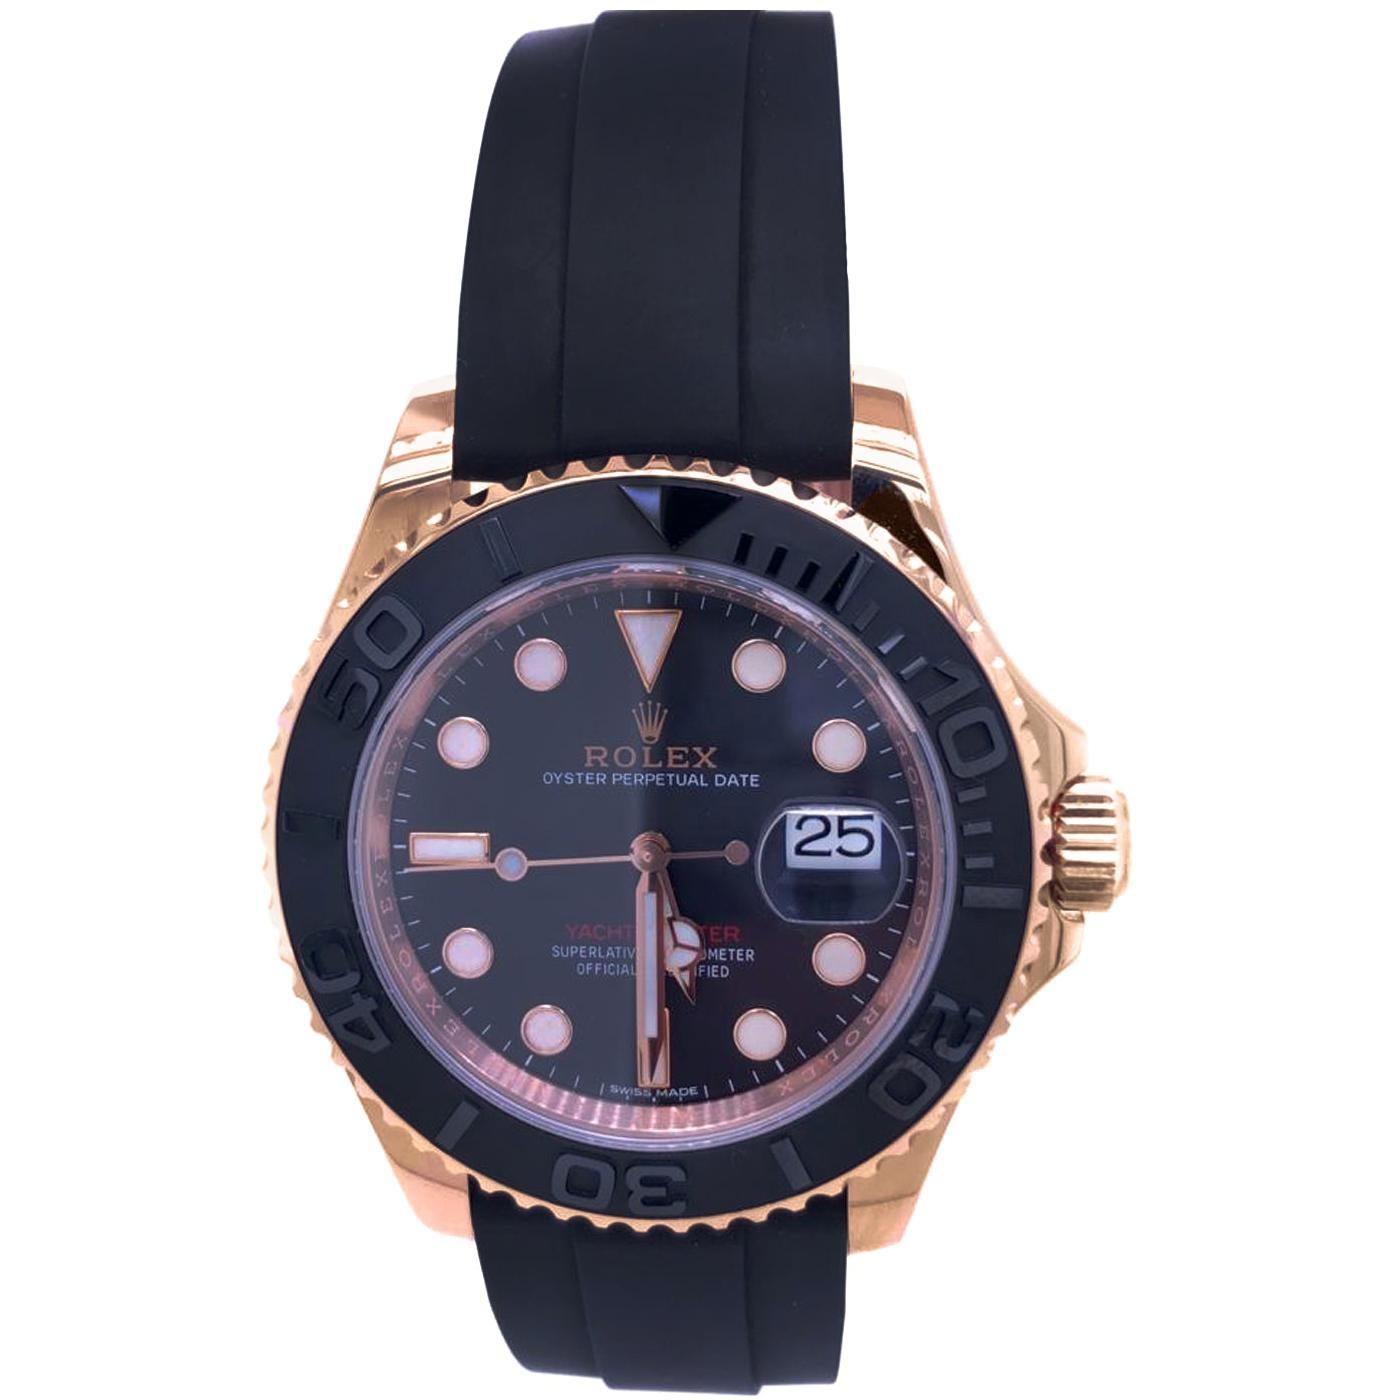 Rolex Yacht-Master 116655 Everose Gold Oysterflex Strap Automatic Watch